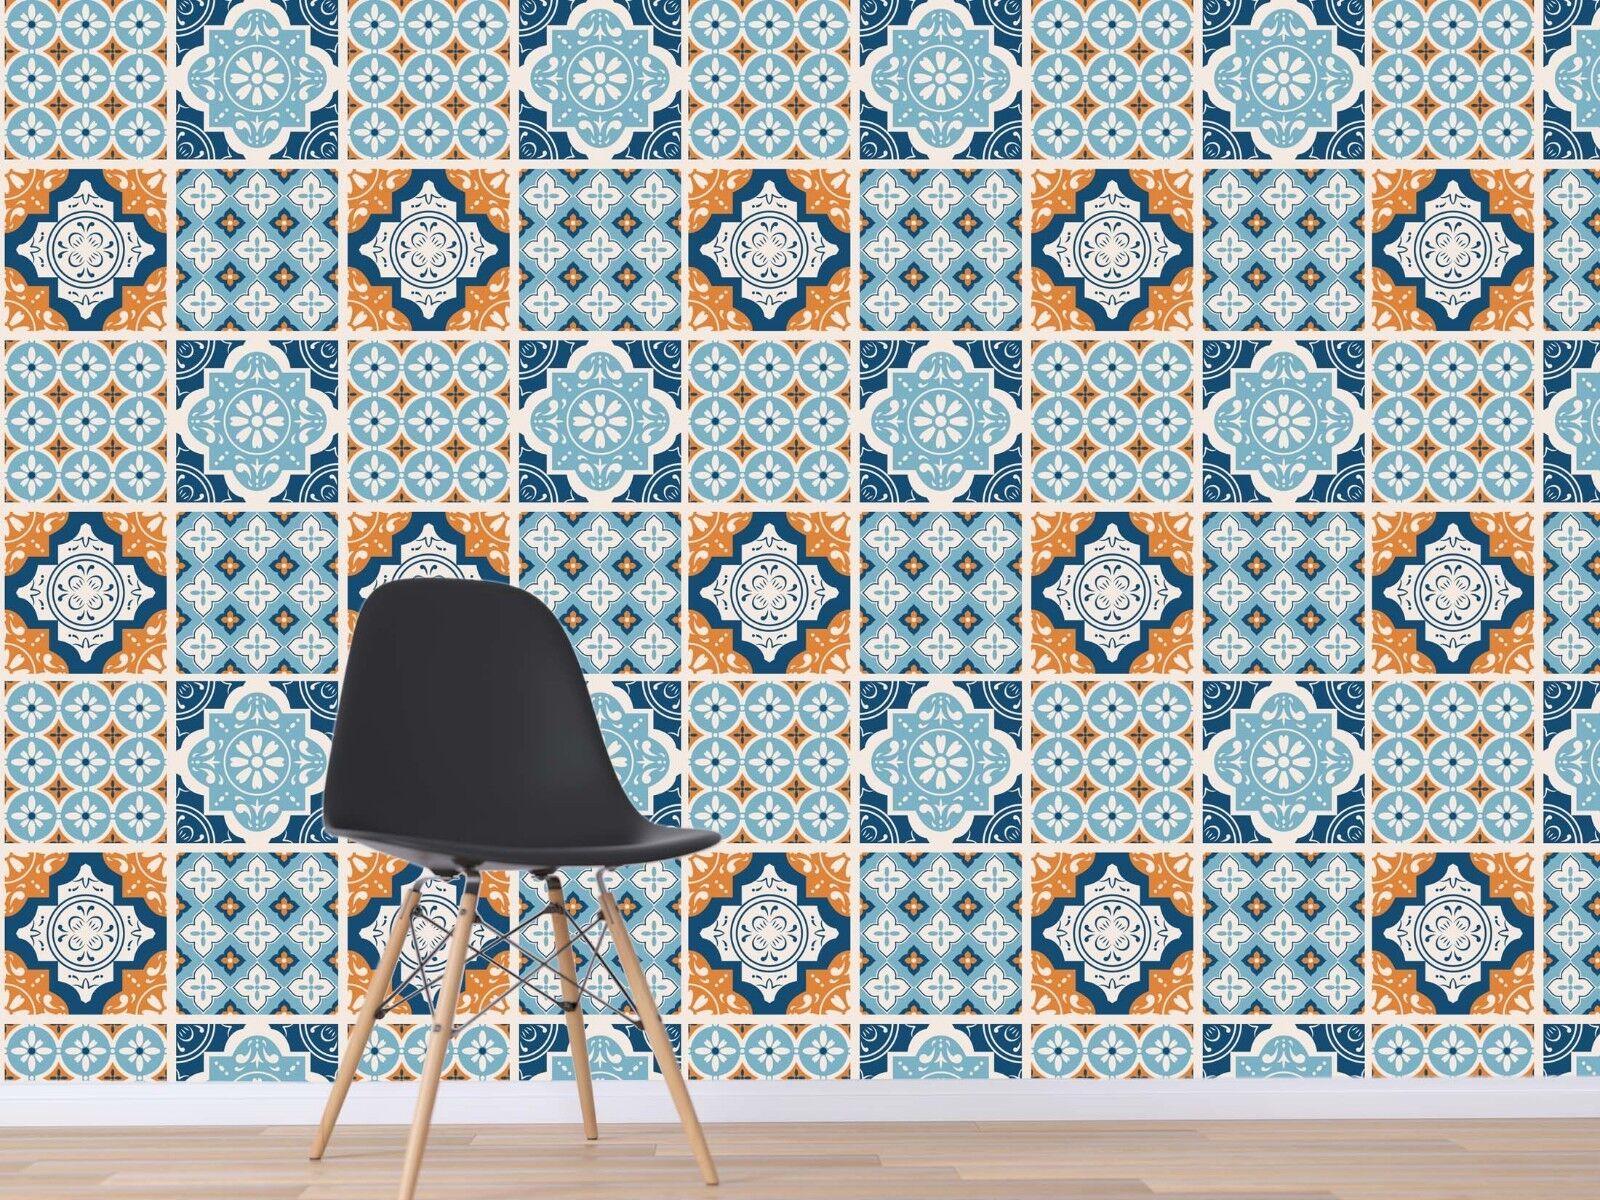 3D Provence Floral Tile 4 Wallpaper Murals Wall Print Wallpaper Mural AJ WALL UK